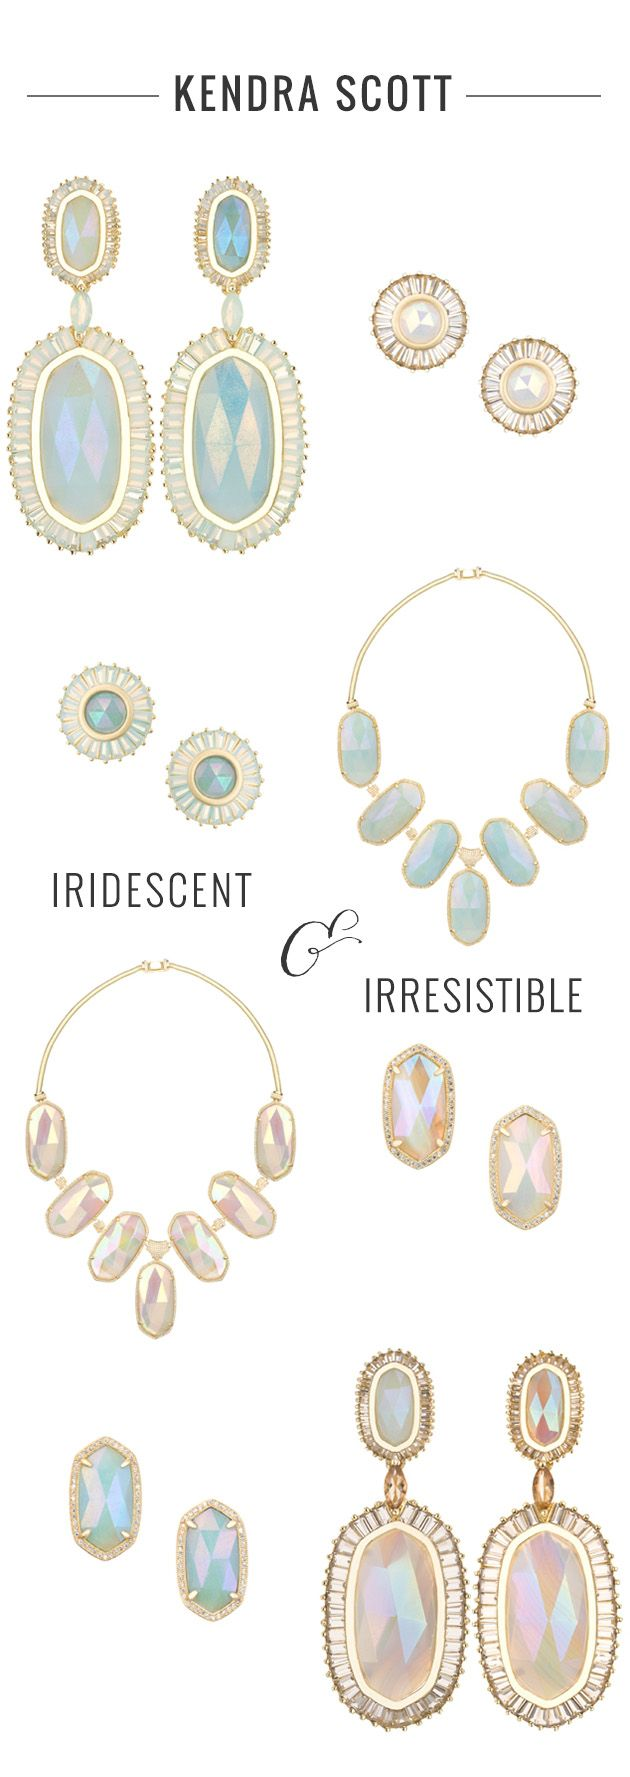 Dreamy Iridescent Bridal Jewelry By Kendra Scott | Bridal Musings Wedding Blog